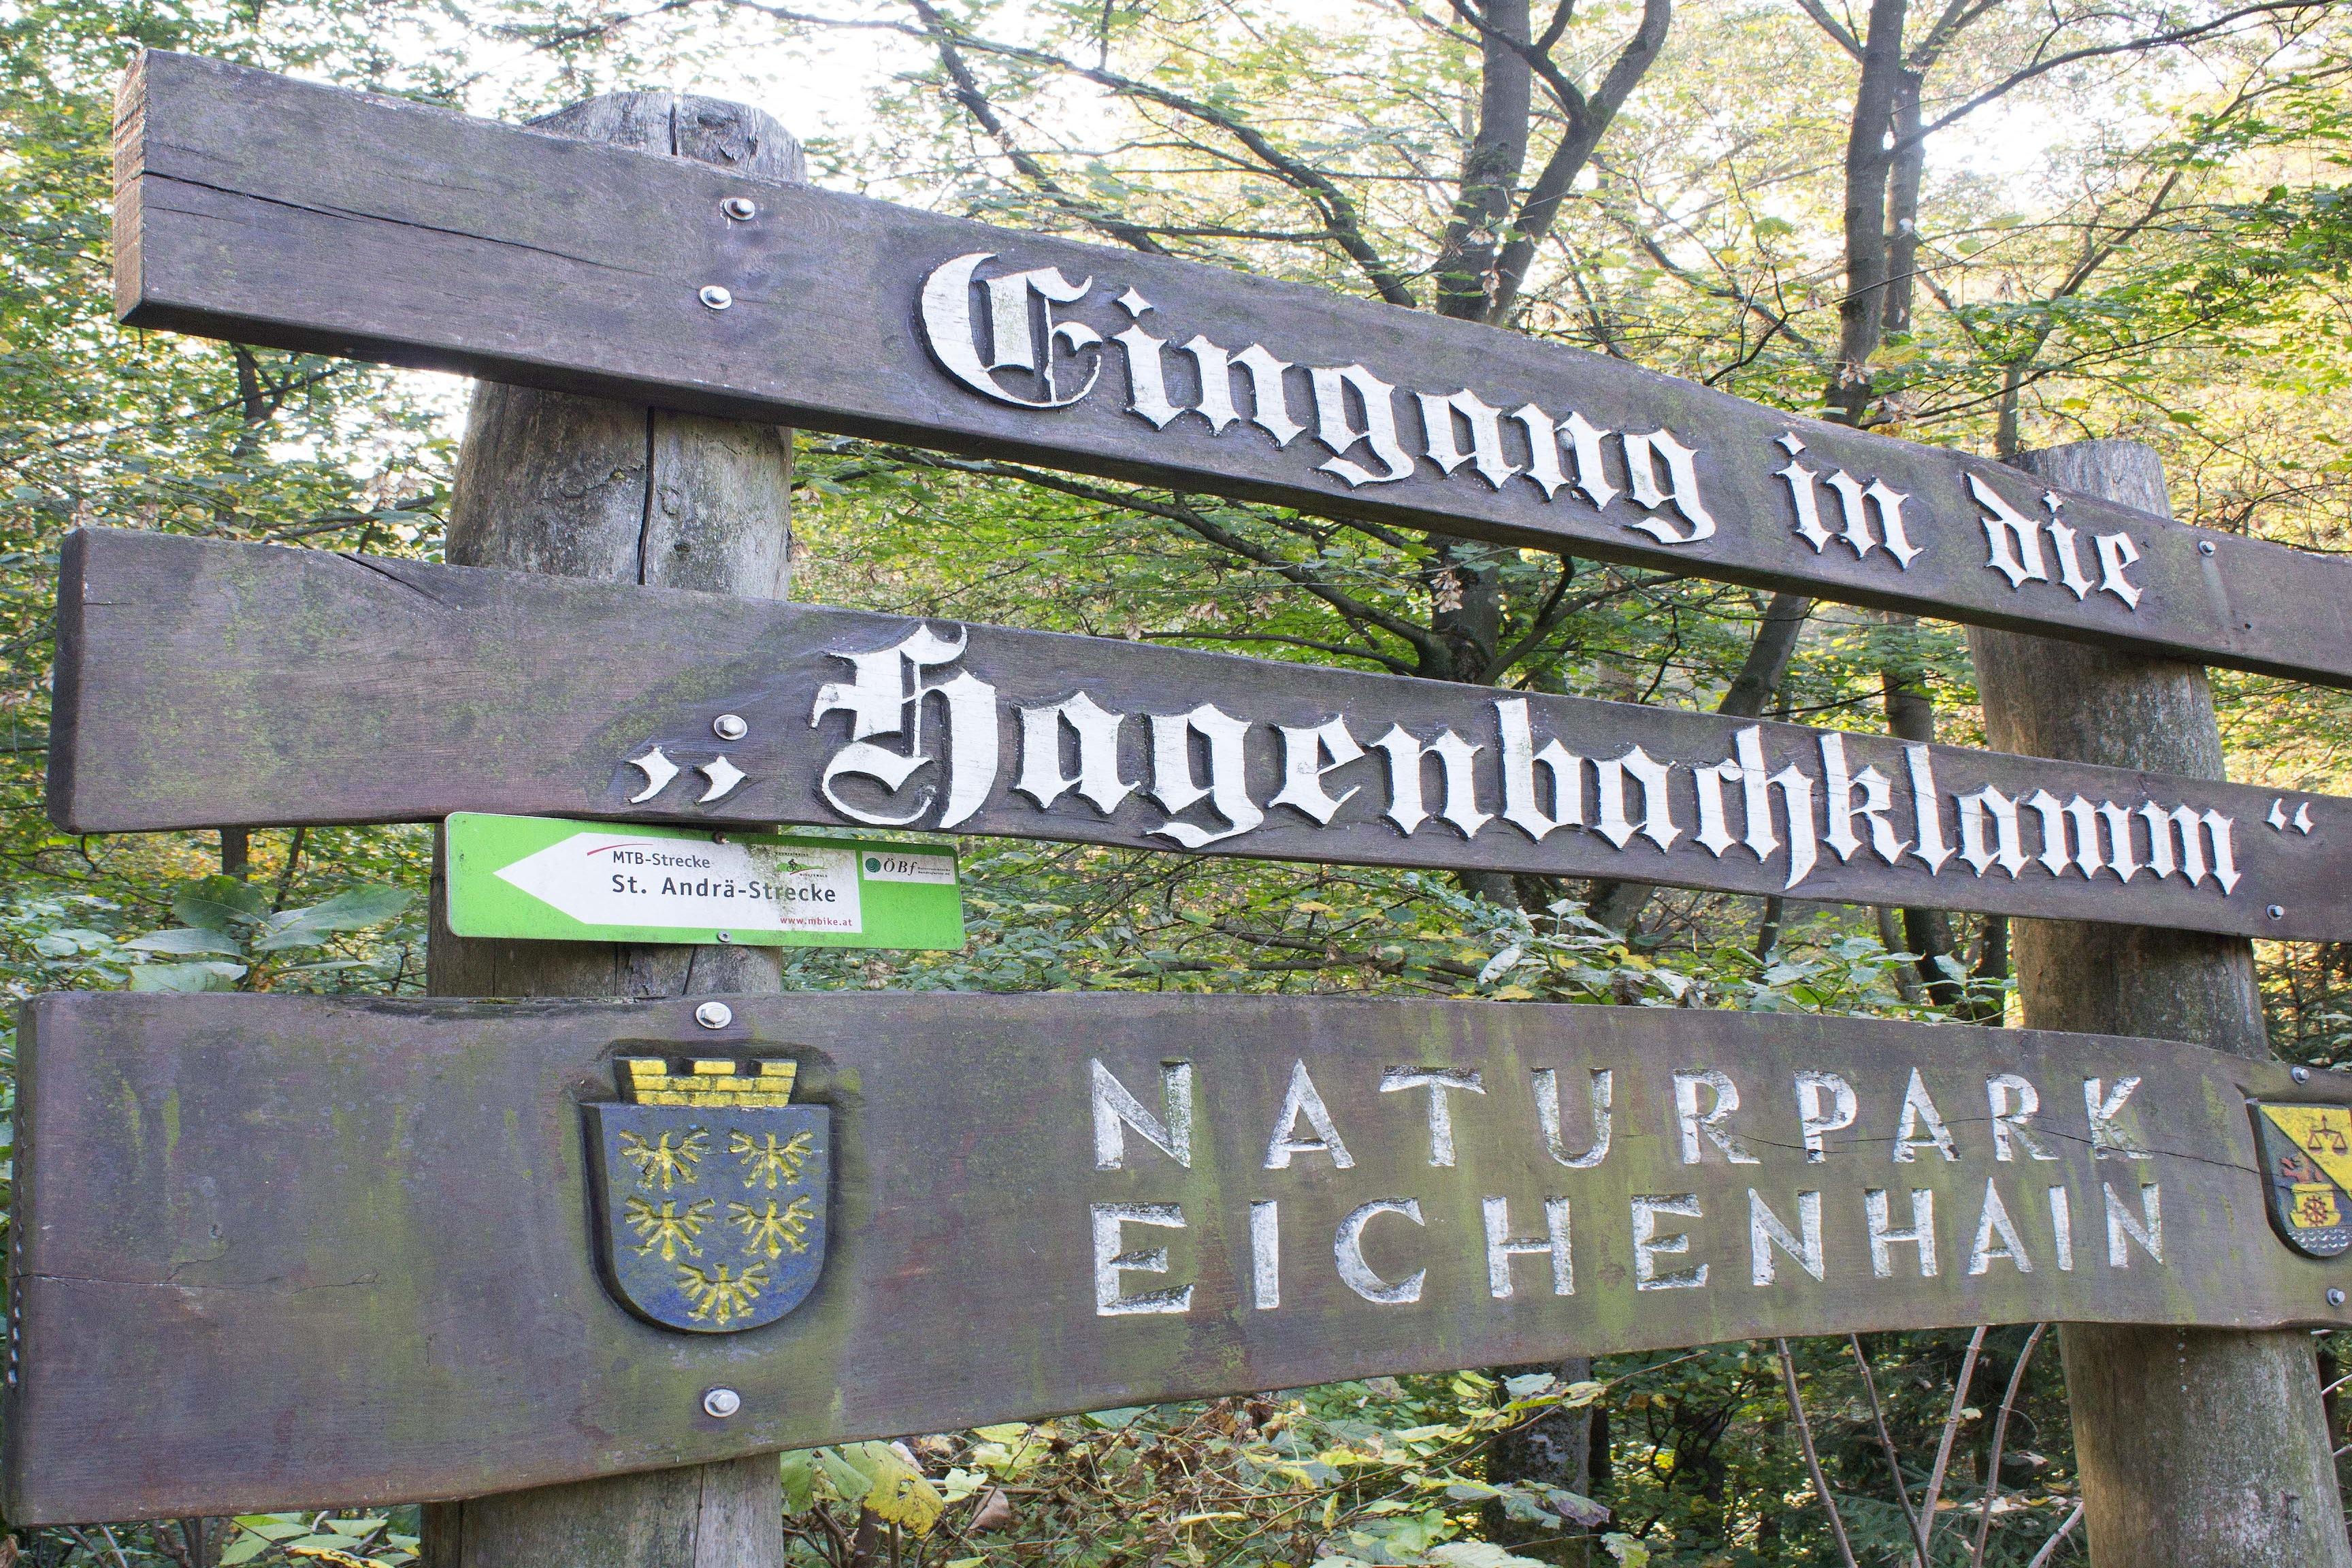 Hagenbachklamm.jpg